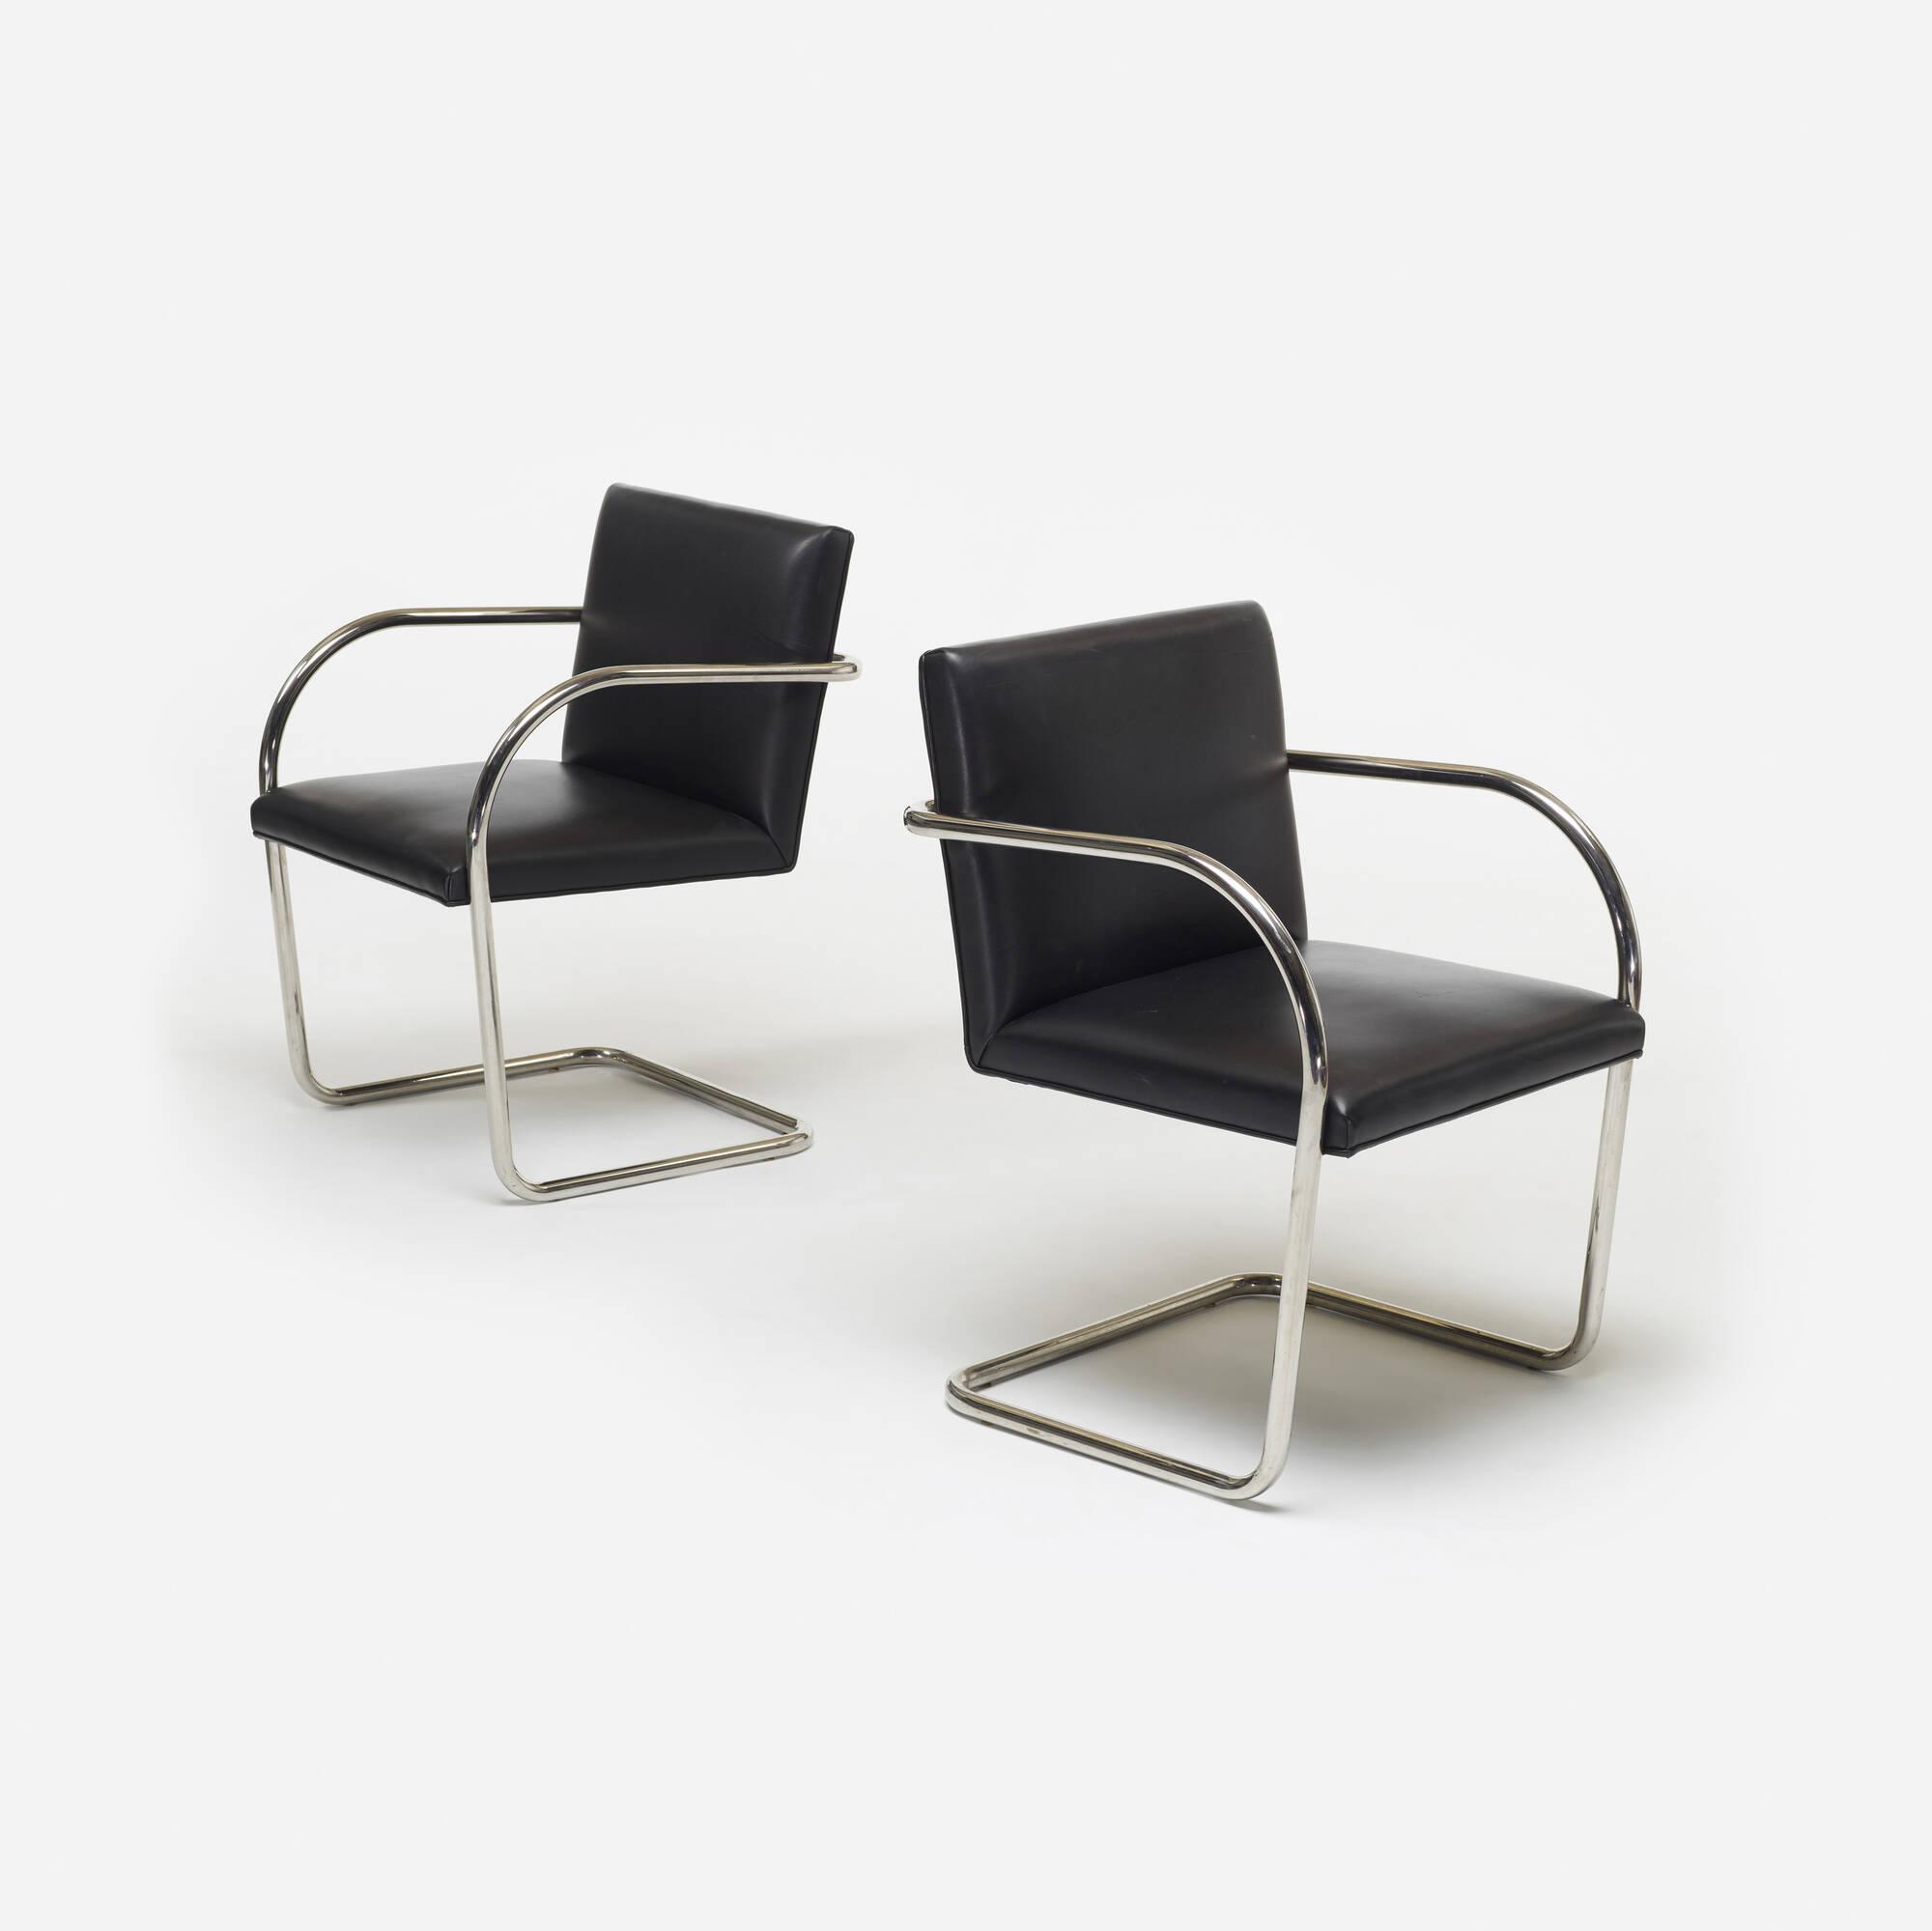 unique mies van der rohe chair. Black Bedroom Furniture Sets. Home Design Ideas